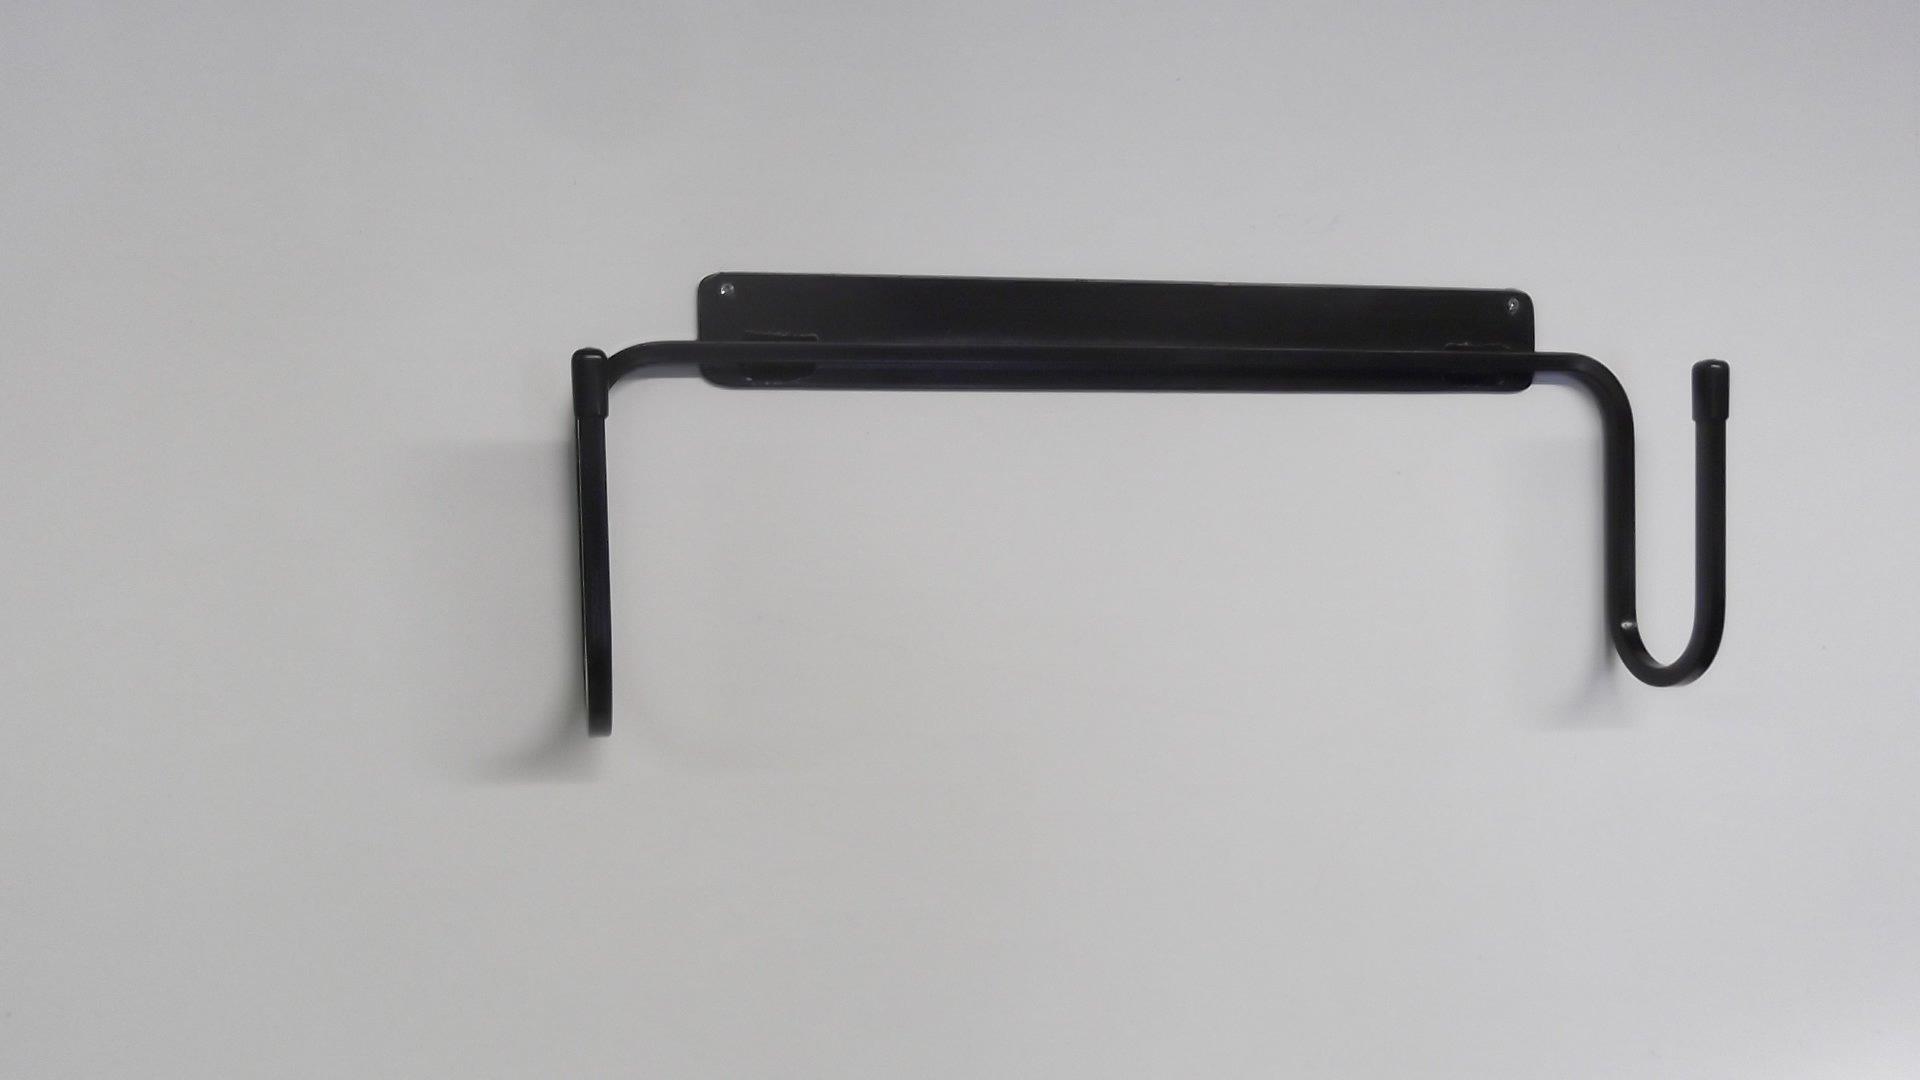 Skimboard Skim Board Wall Rack Hanger Display Mount by Hang It Up